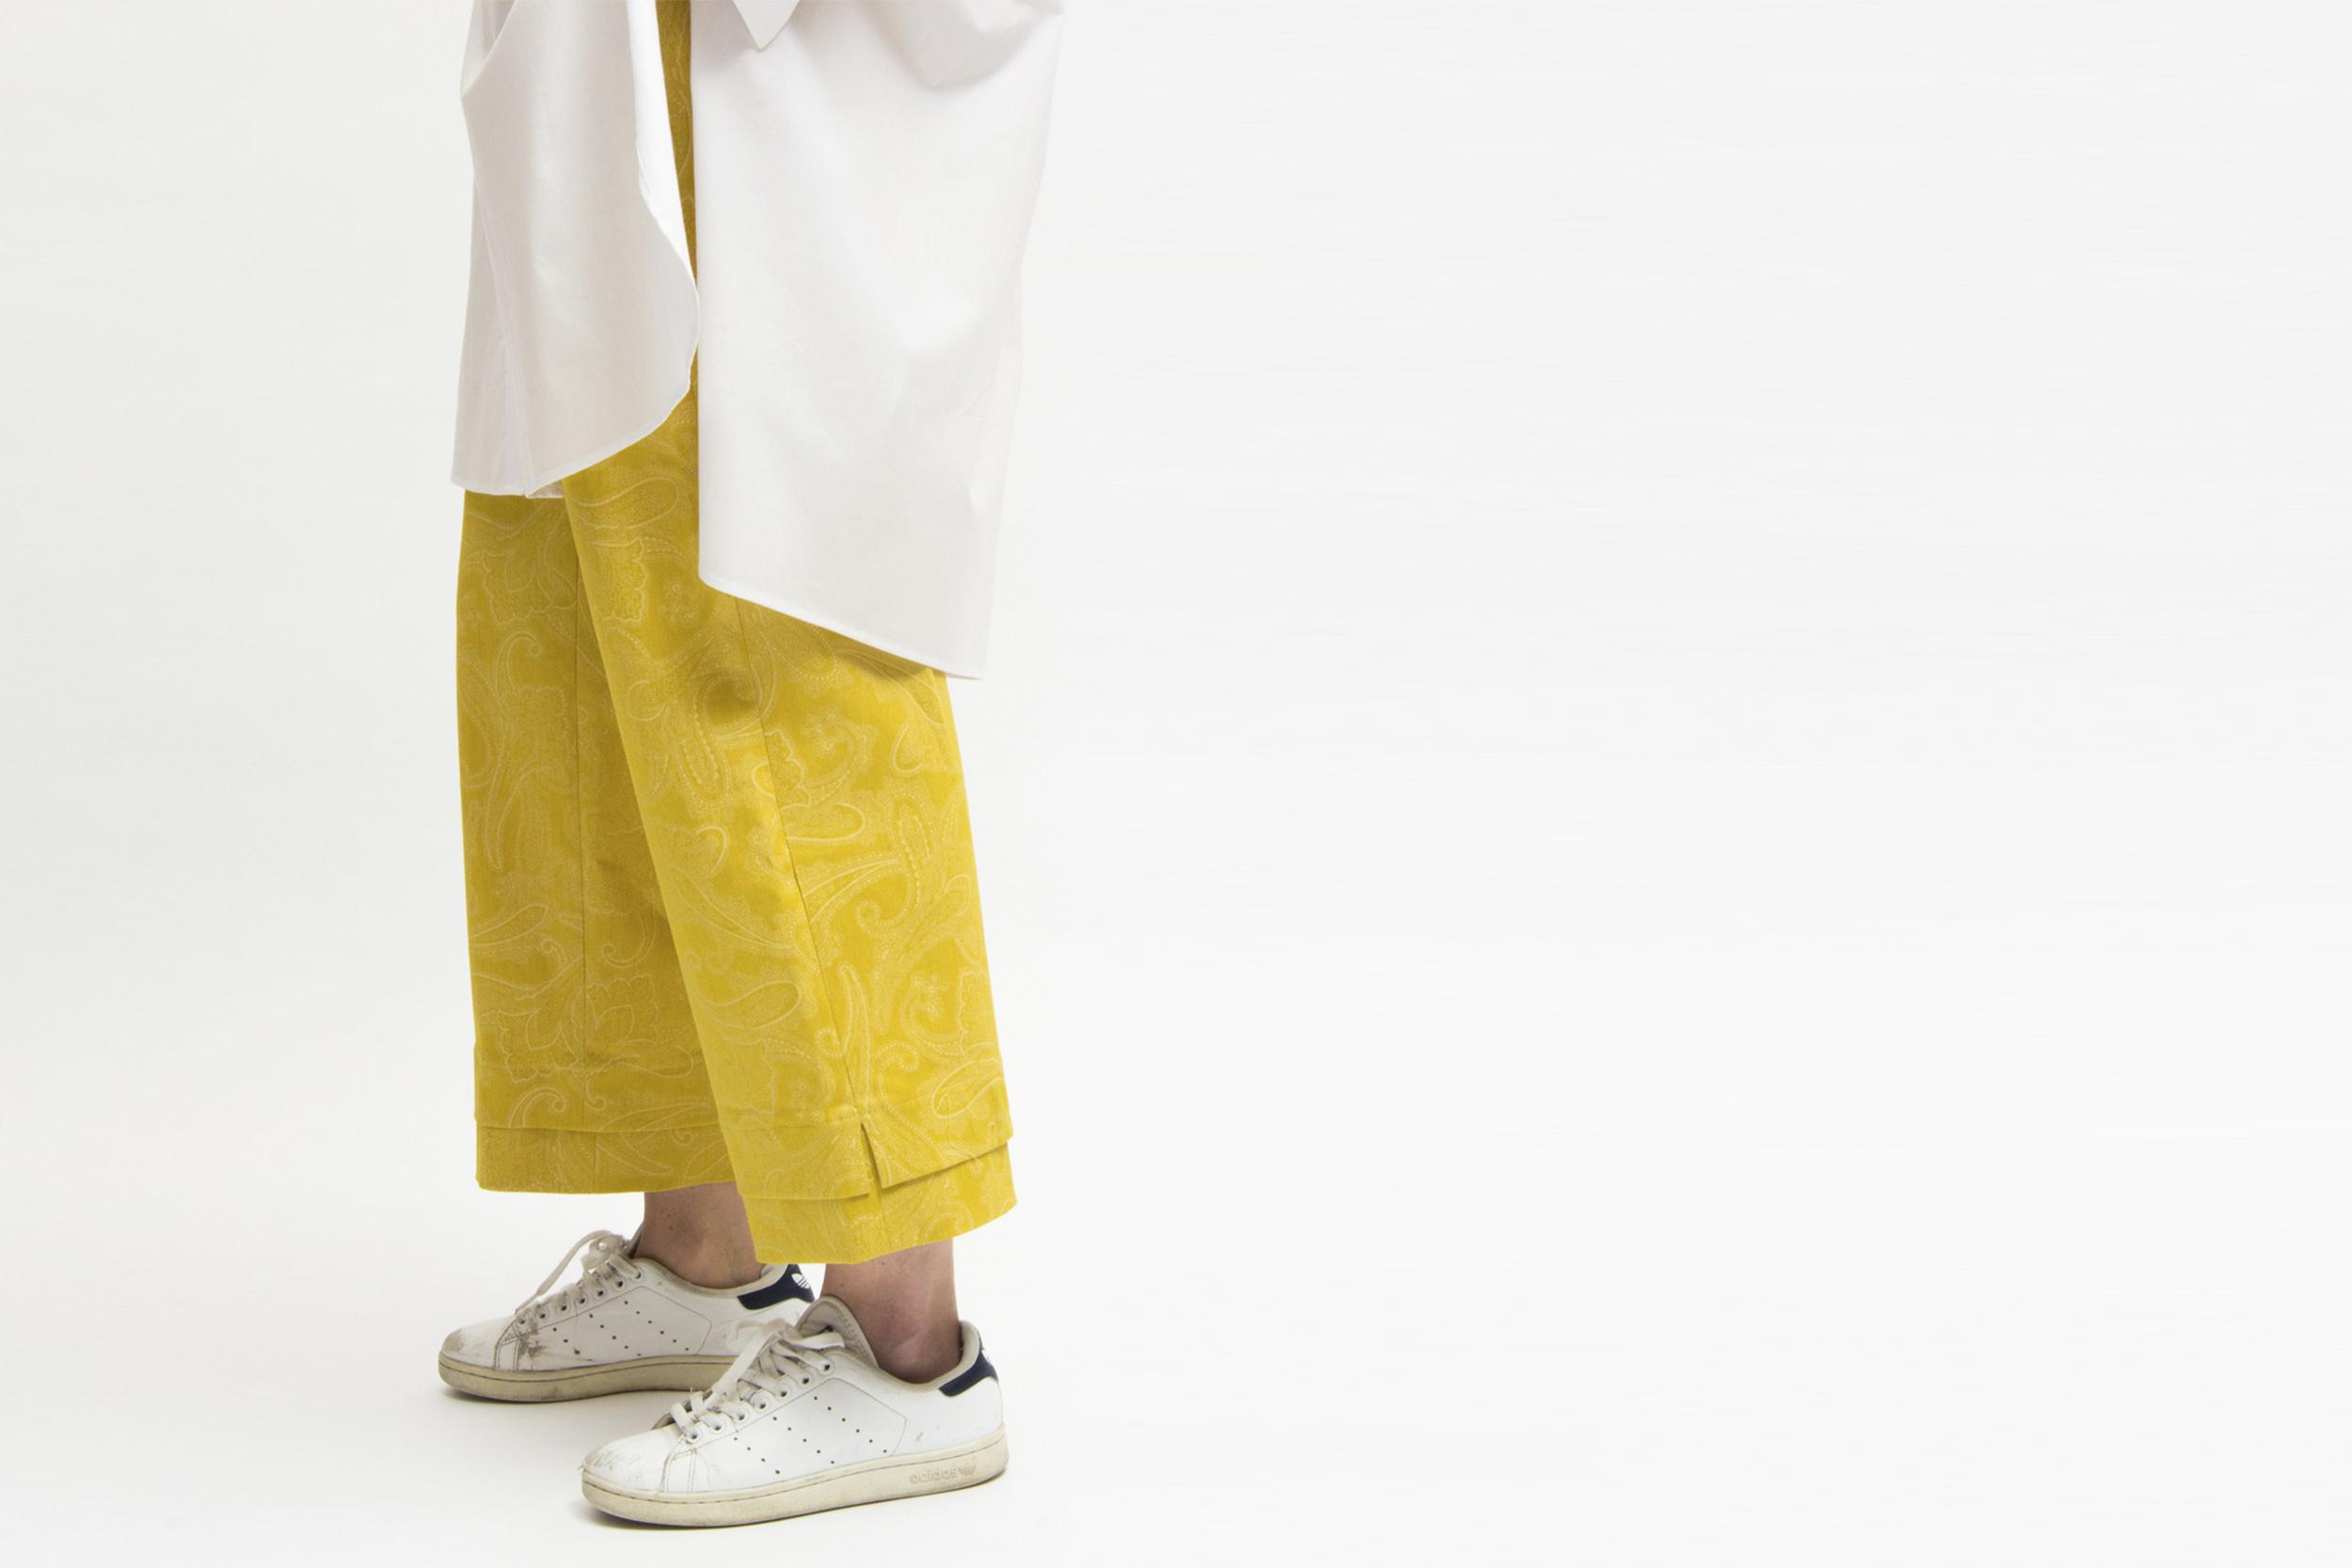 chiara_sonda_fashion_berto_for_young_talents_yellow_panta.jpg